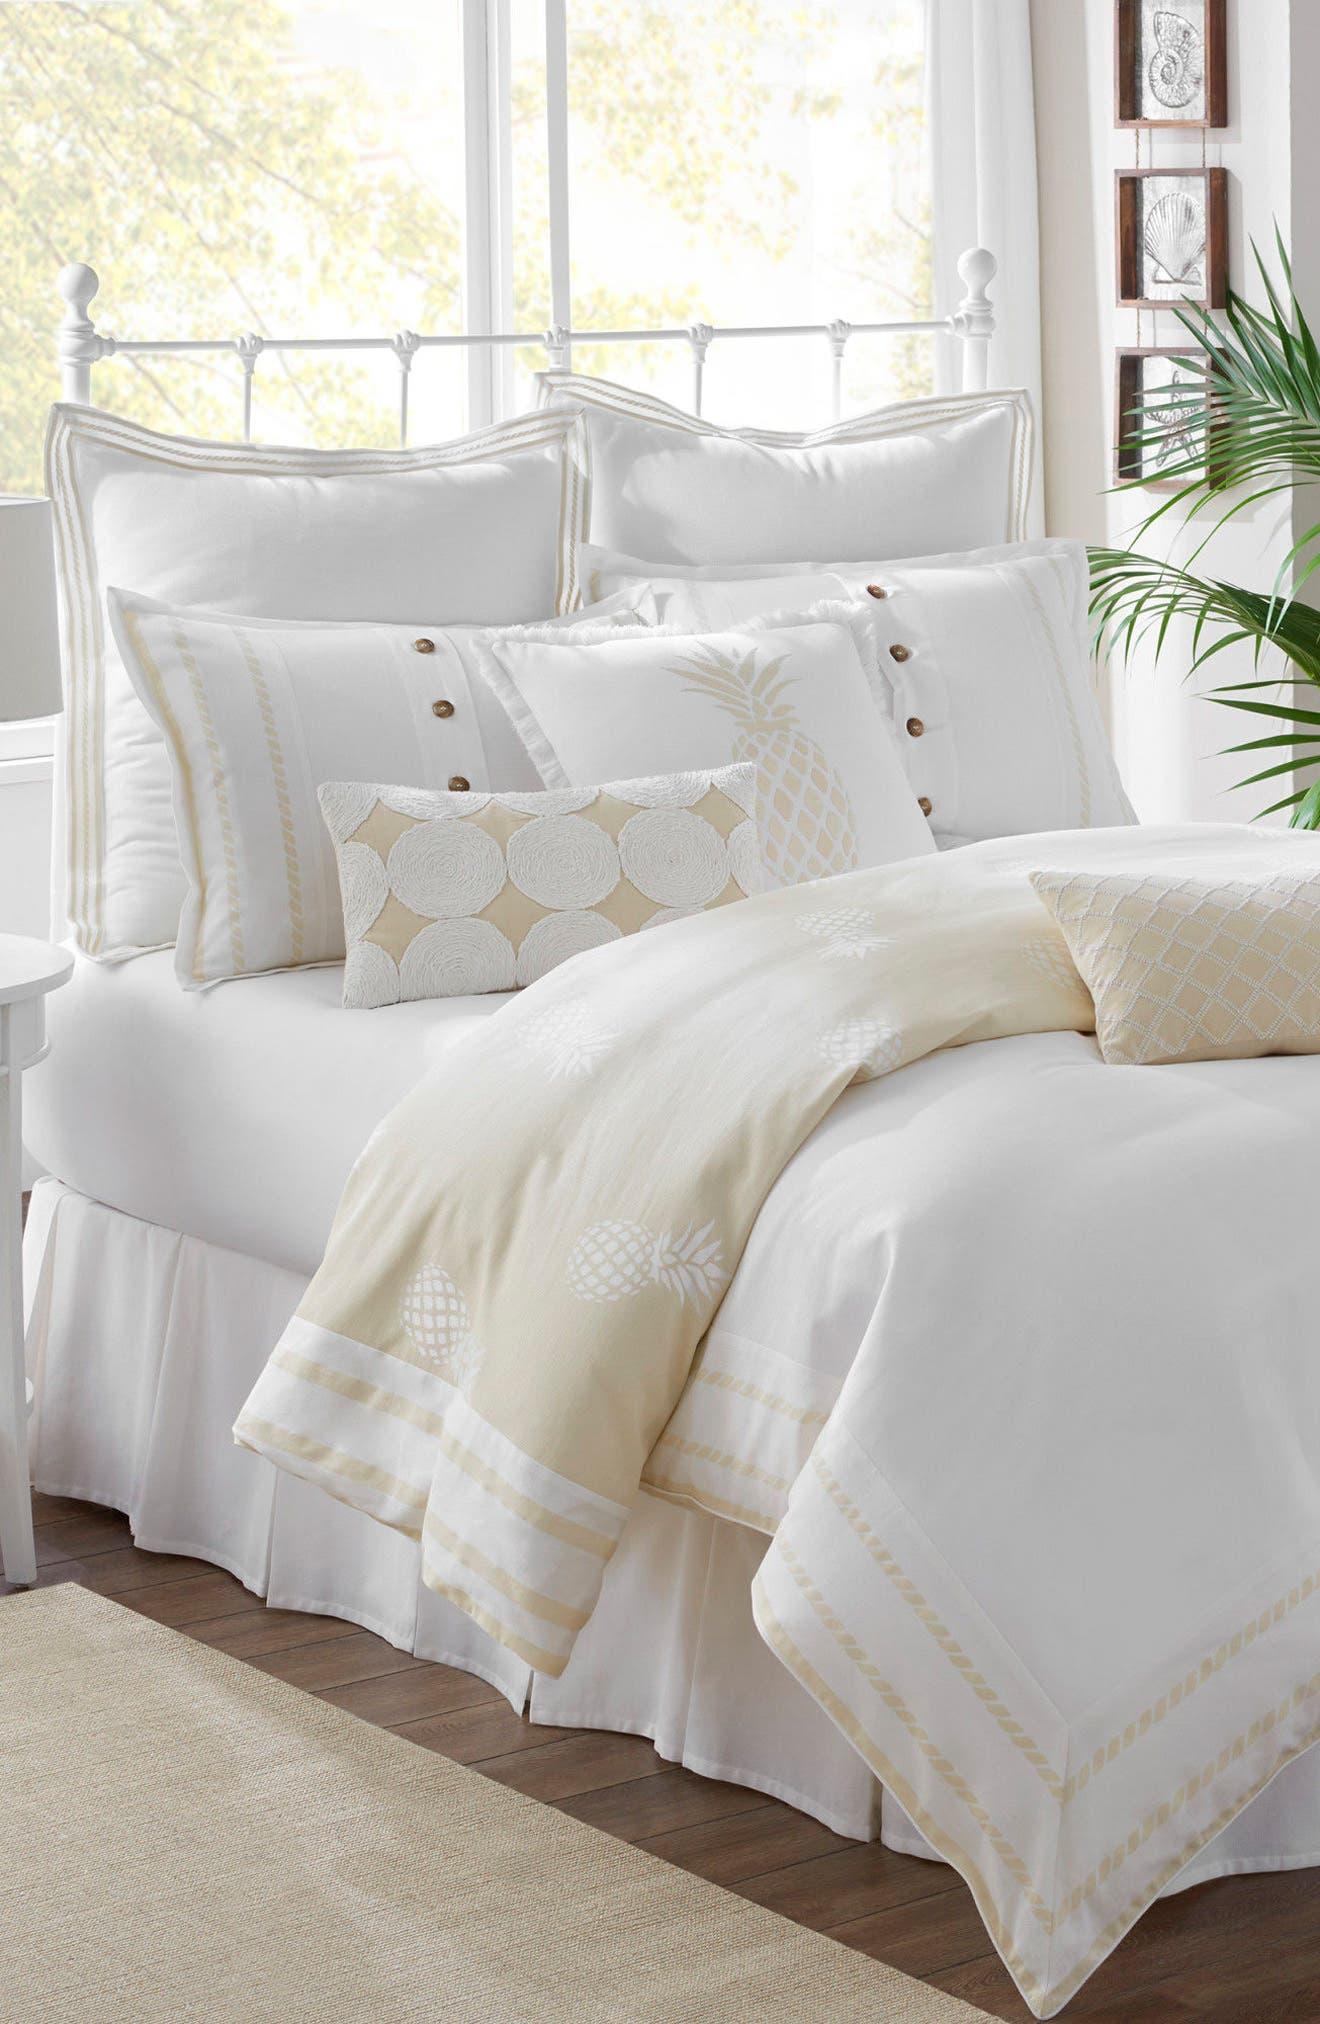 Southern Hospitality Comforter, Sham & Bed Skirt Set,                         Main,                         color, 250